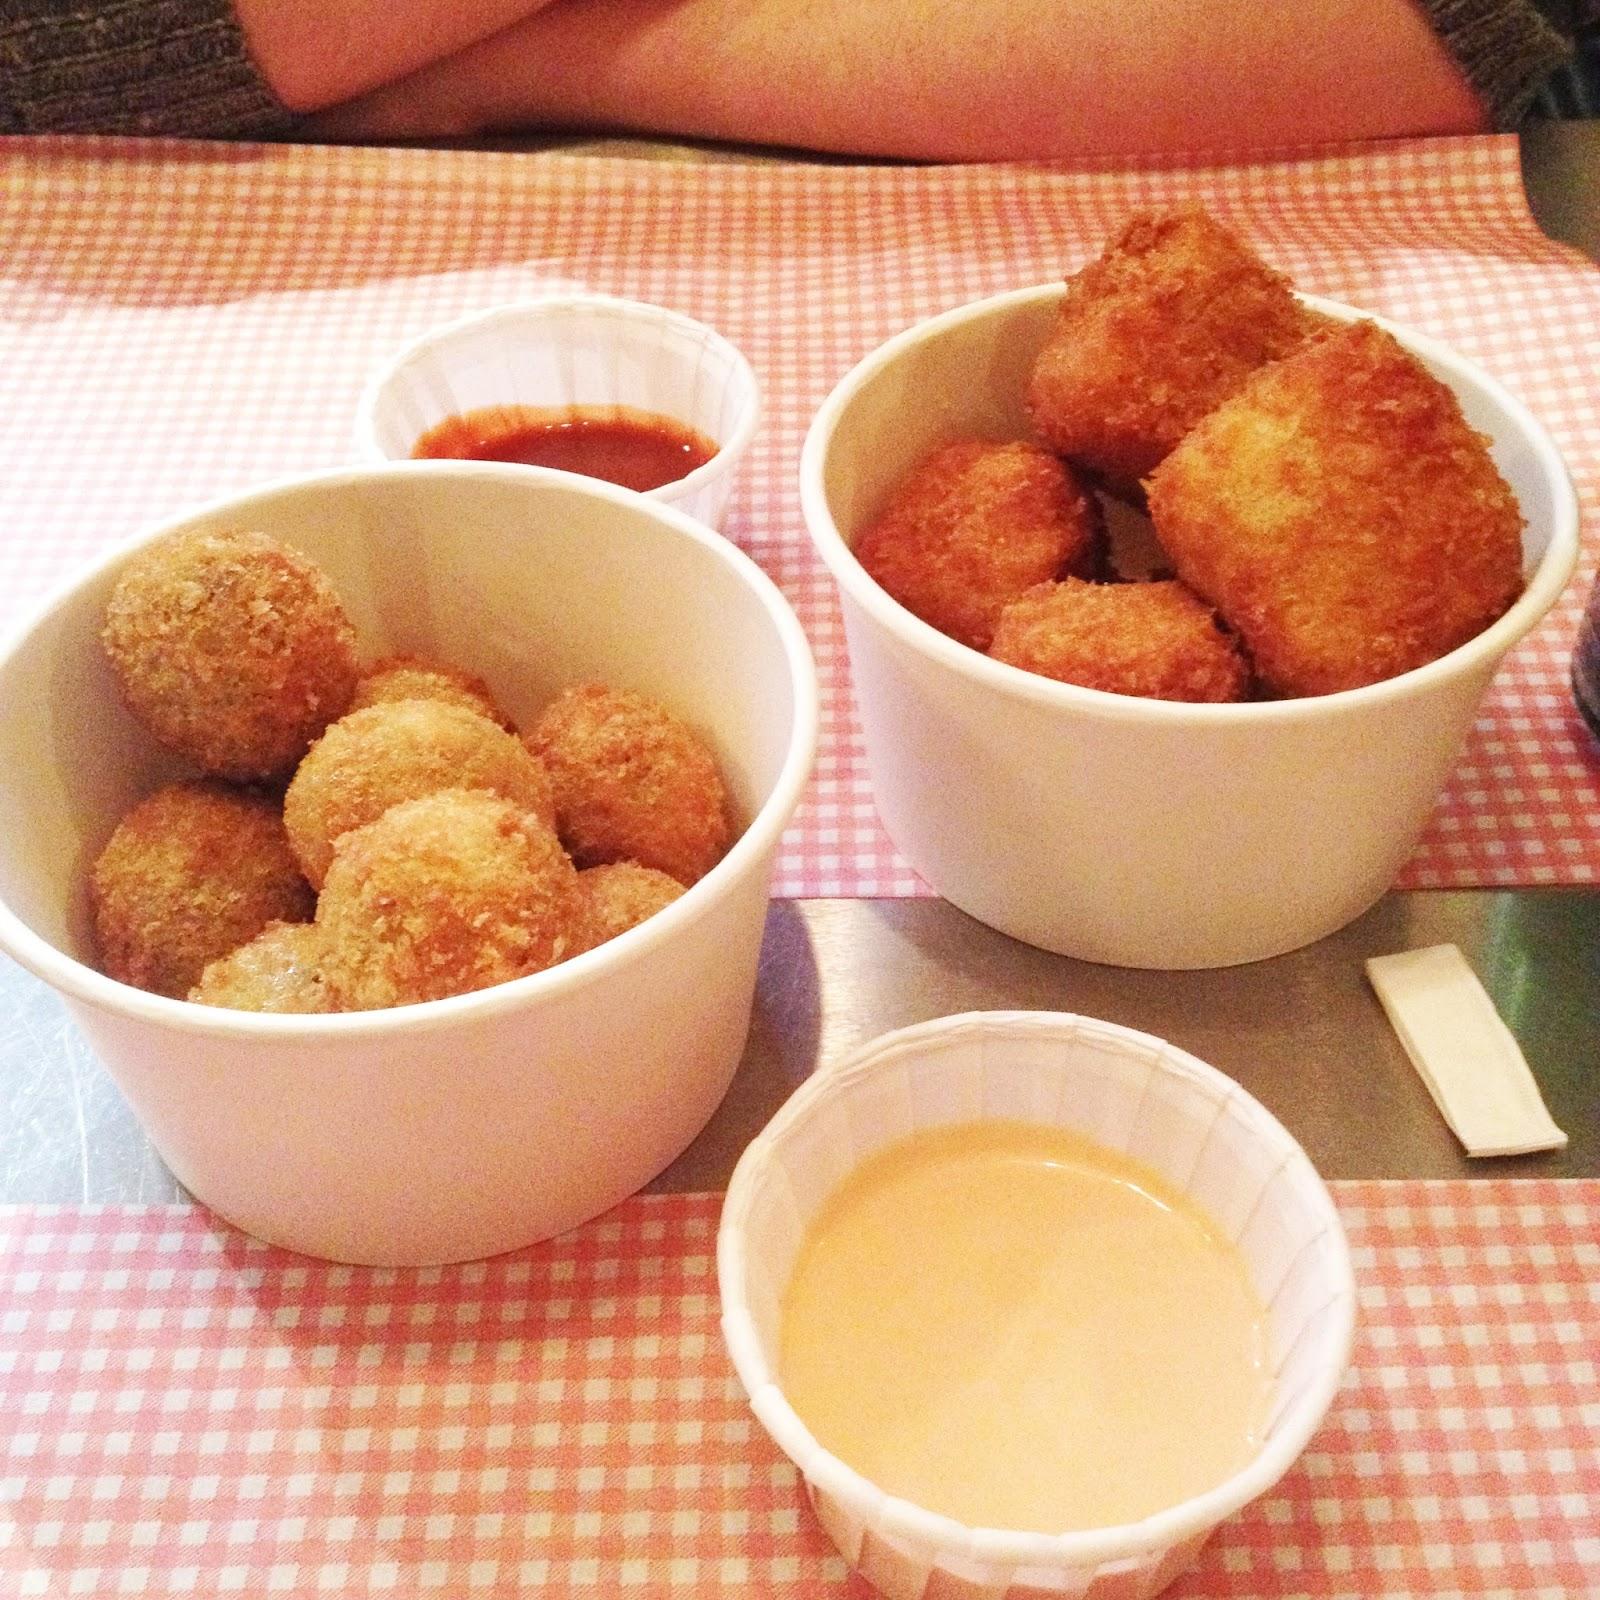 The Glasgow Burgerthon - Burger Meats Bun | Wasted Little PJ Scottish Male Lifestyle Blog